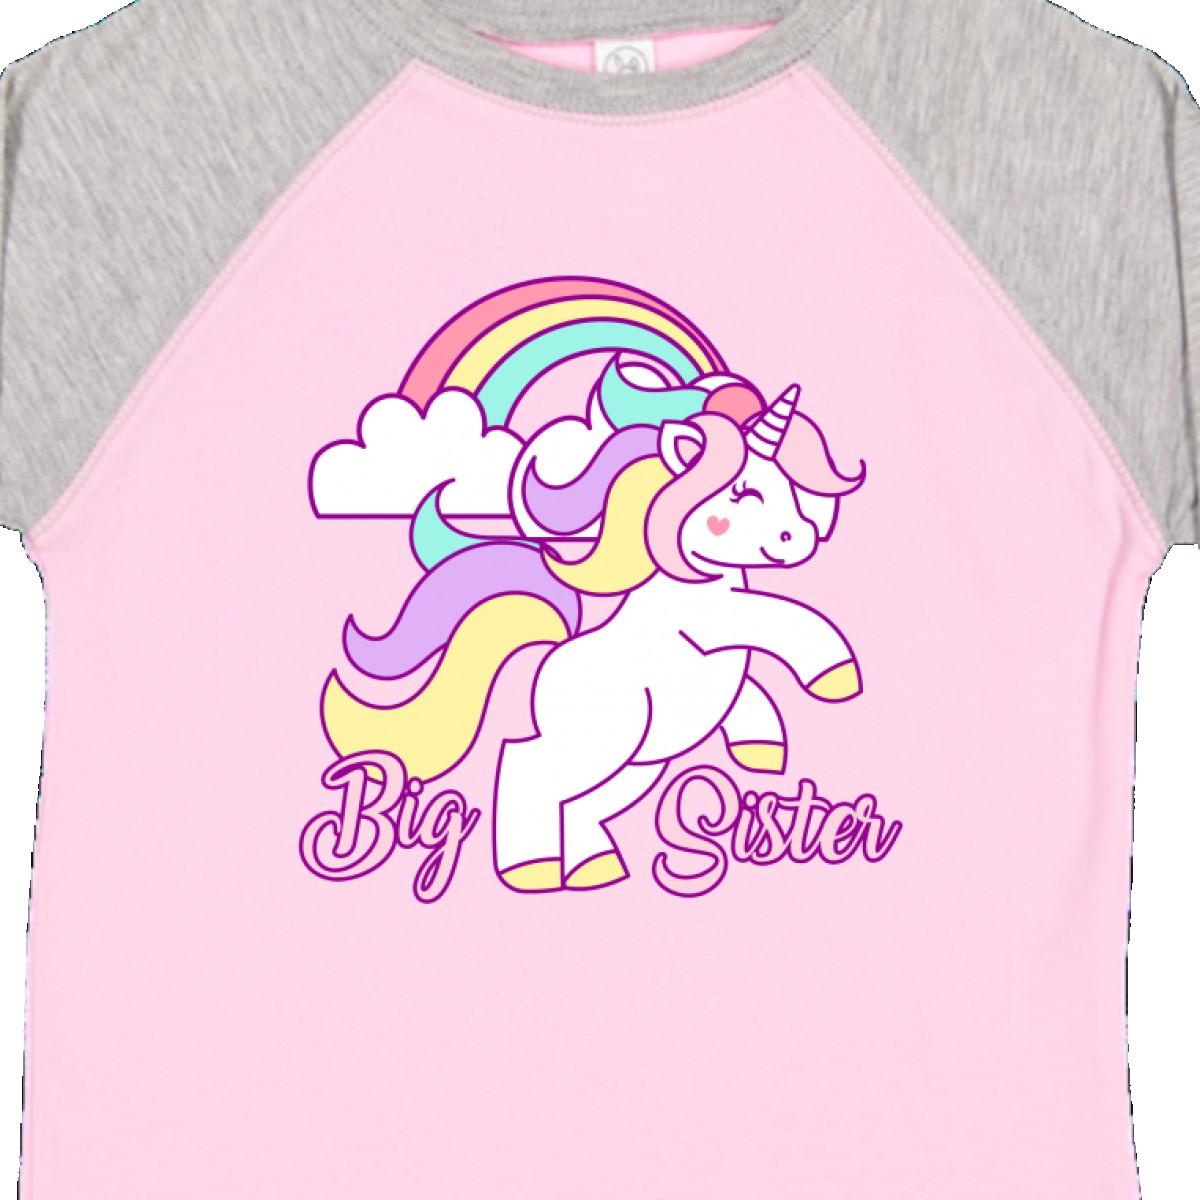 Inktastic-Big-Sister-Unicorn-Toddler-T-Shirt-Fantasy-Happy-Child-Preschooler-Kid thumbnail 10